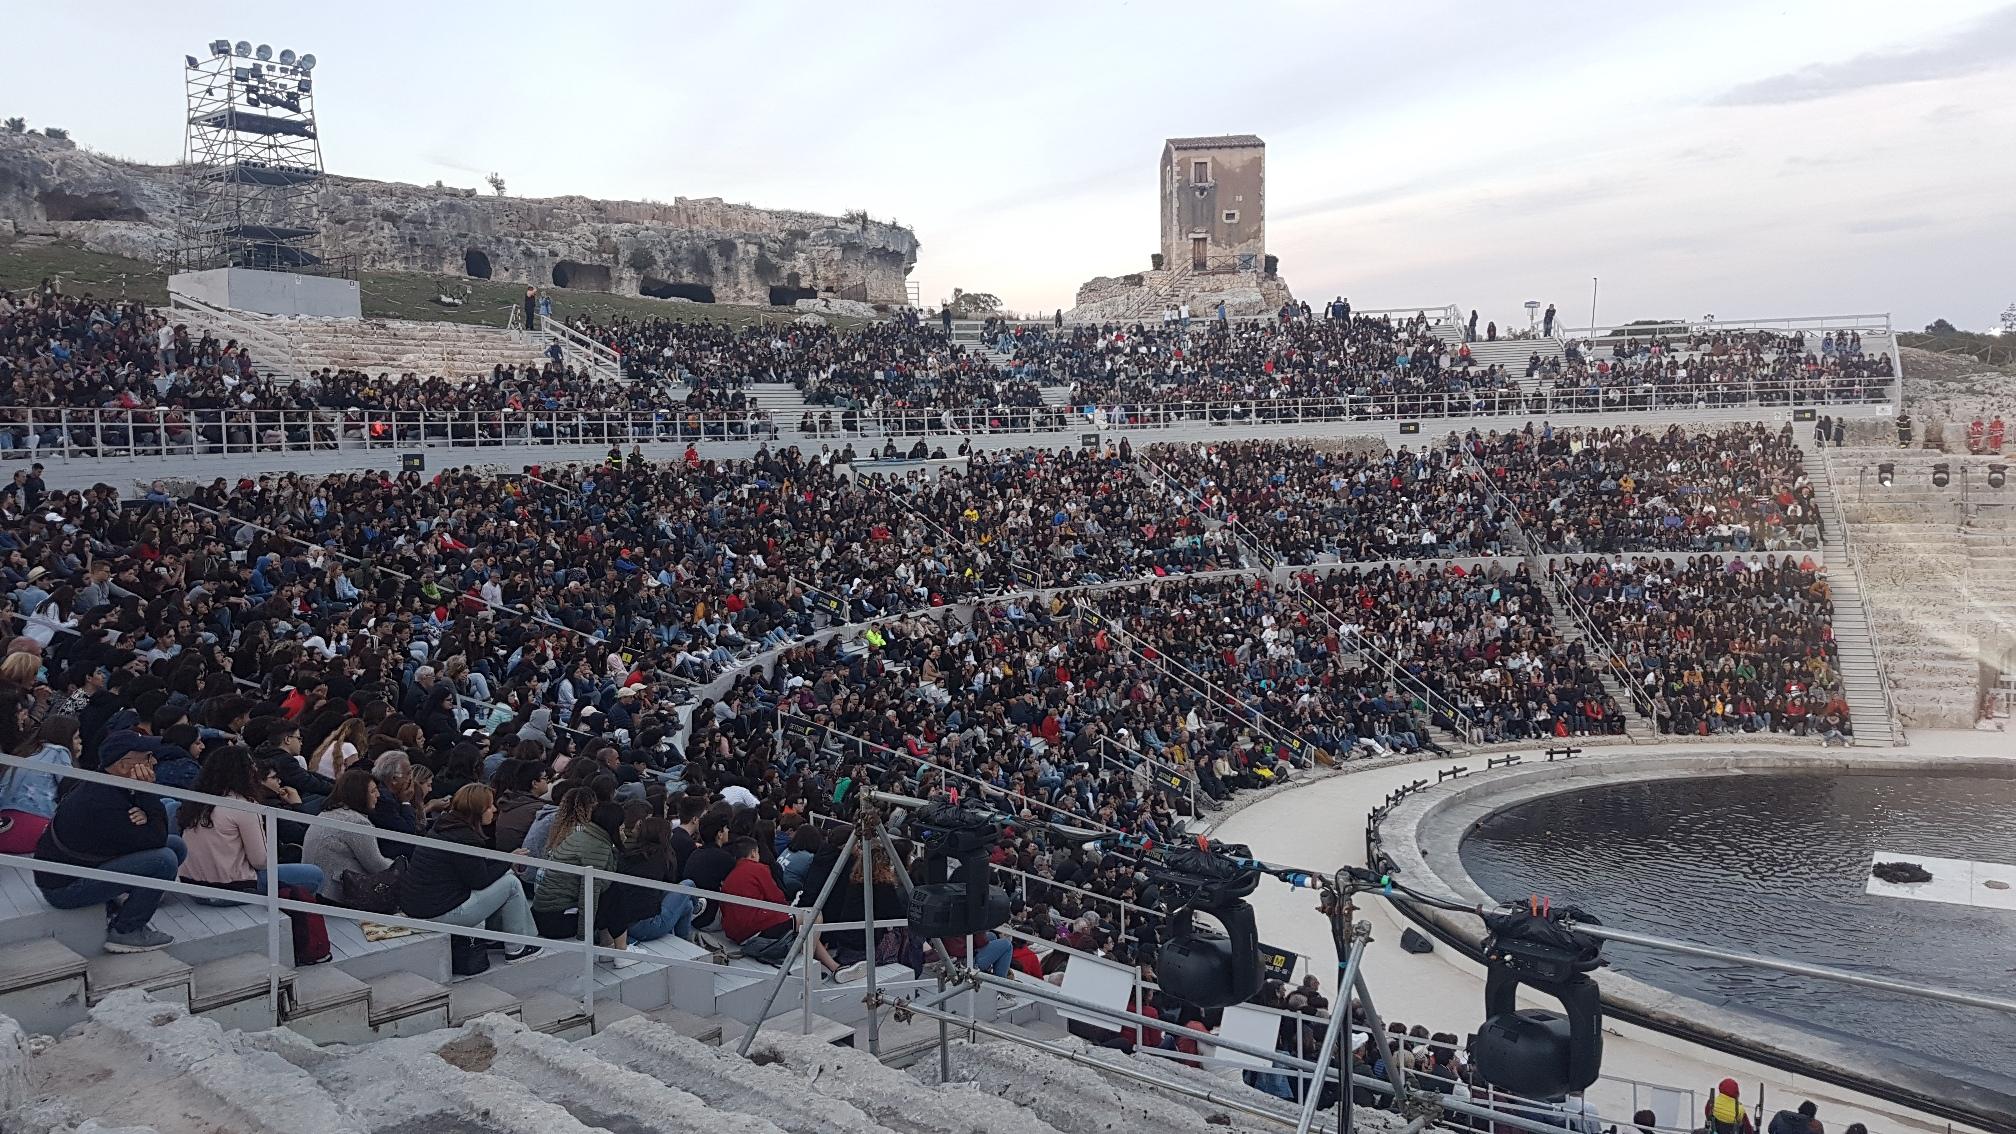 teatro greco di siracusa.jpg